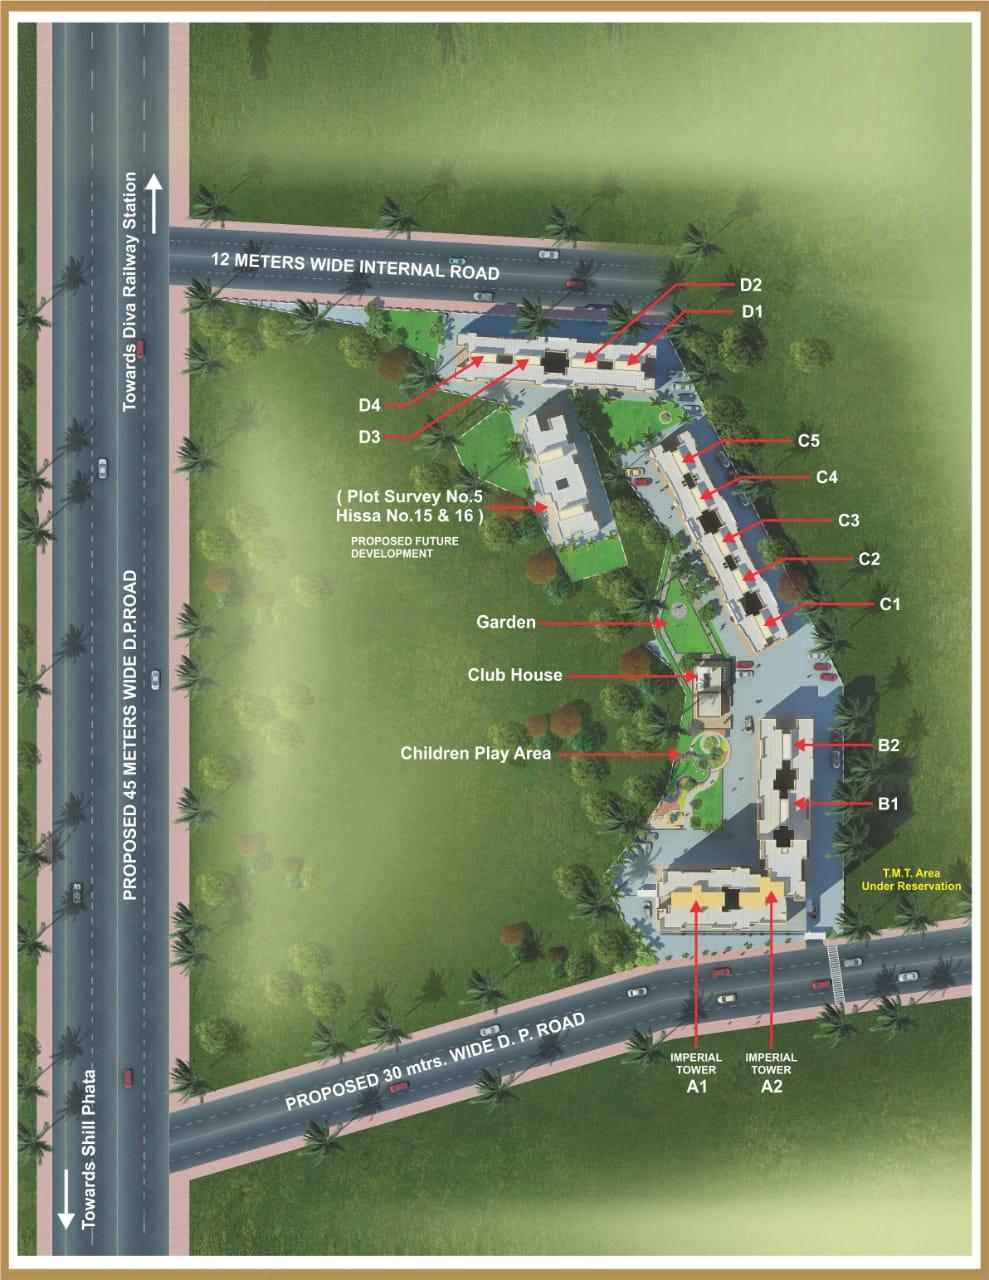 unique buildcorn imperial tower master plan image1